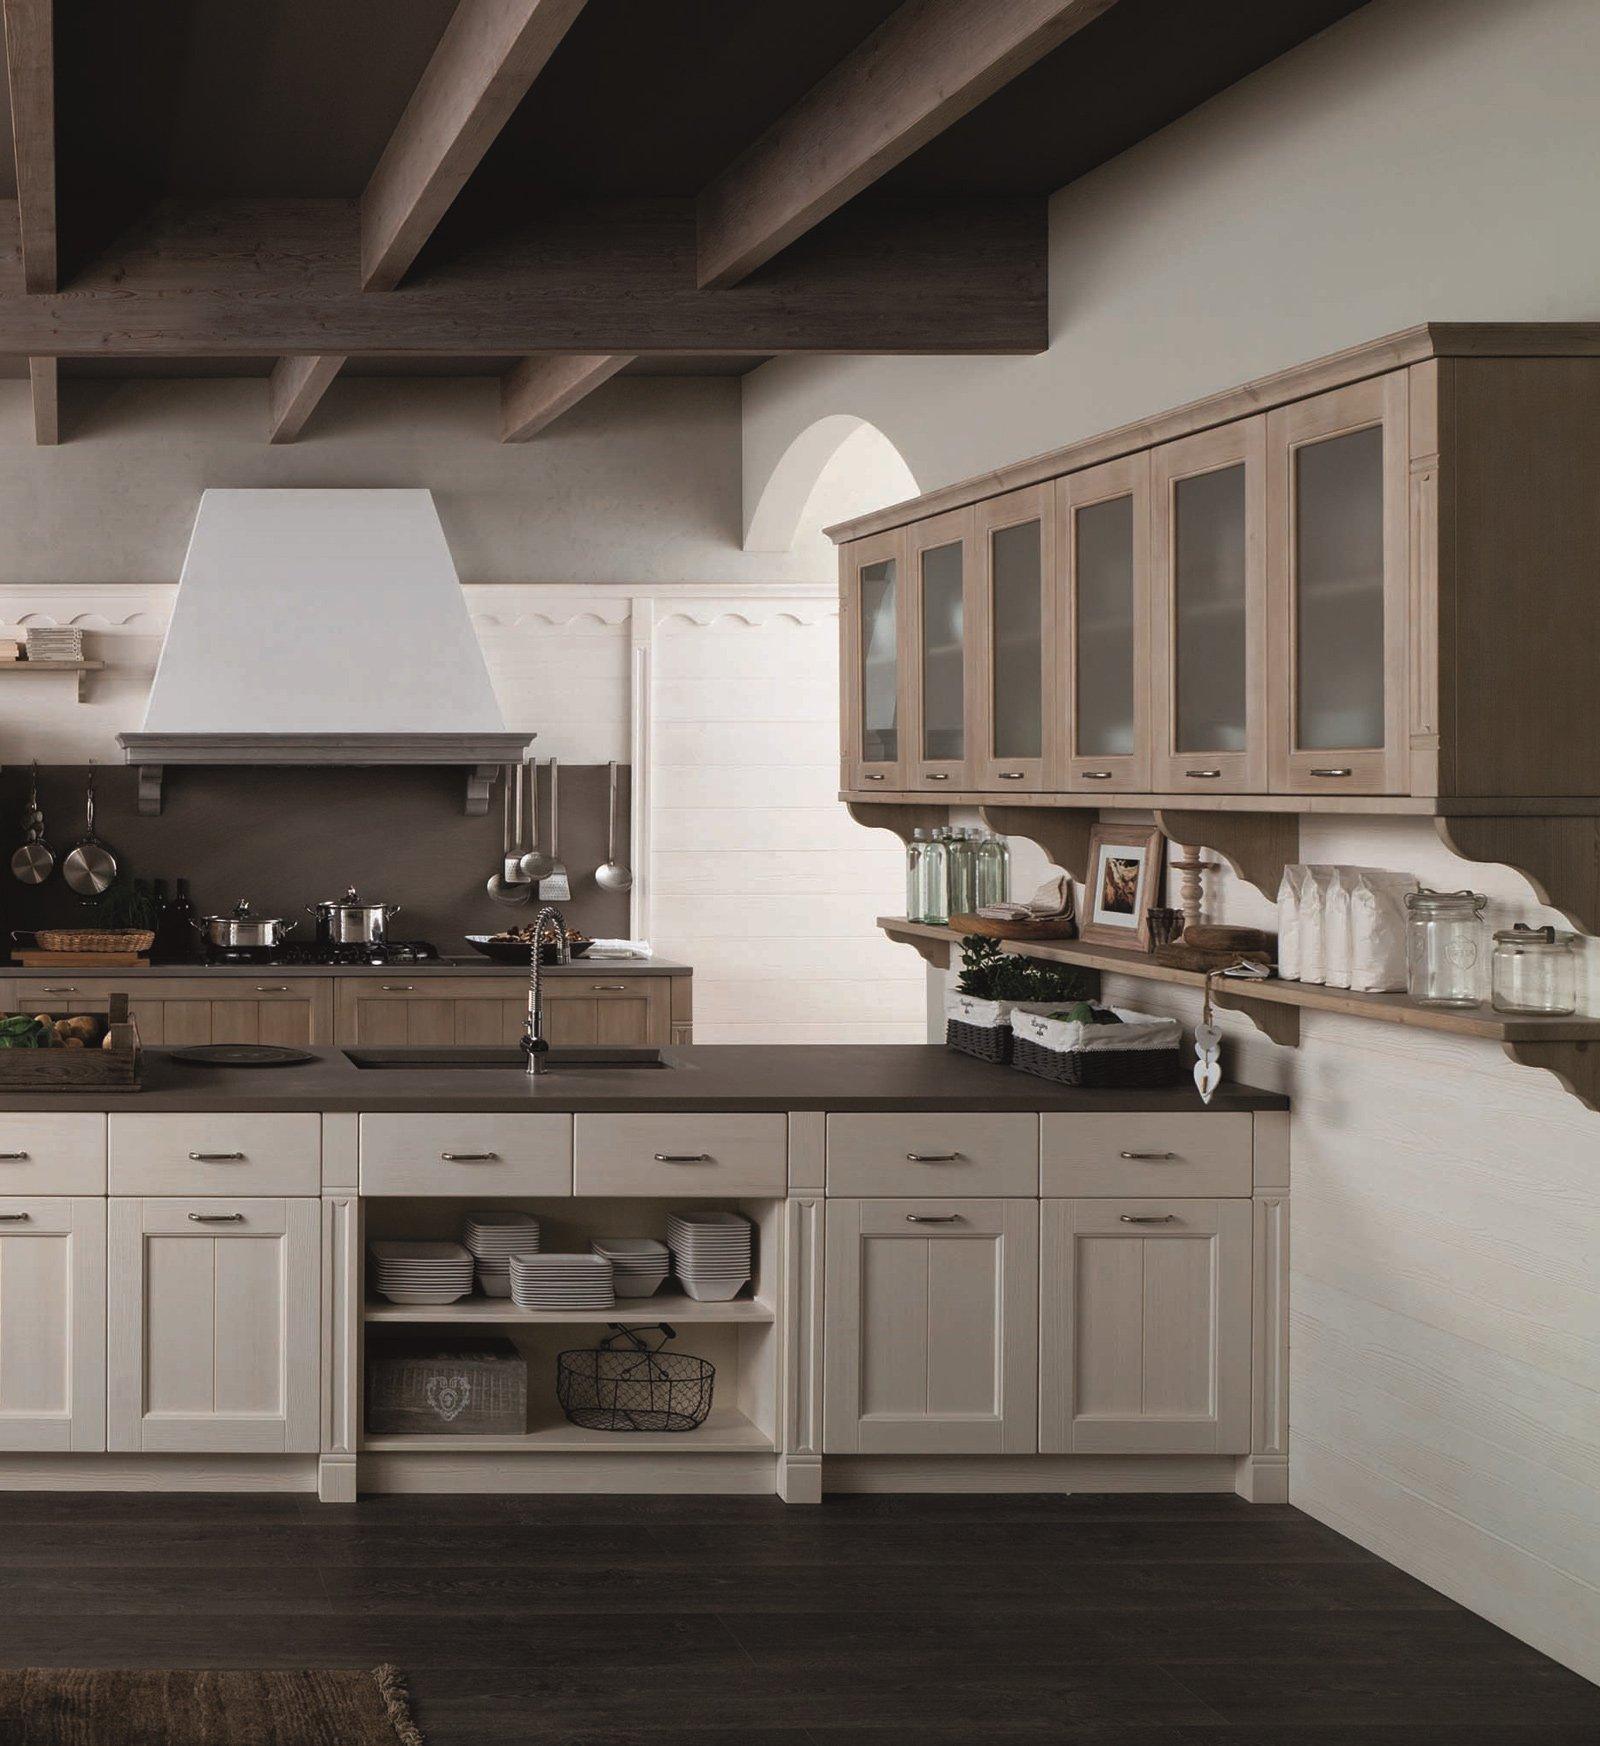 Pensili cucina pensile with pensili cucina cool cucina - Profondita pensili cucina ...